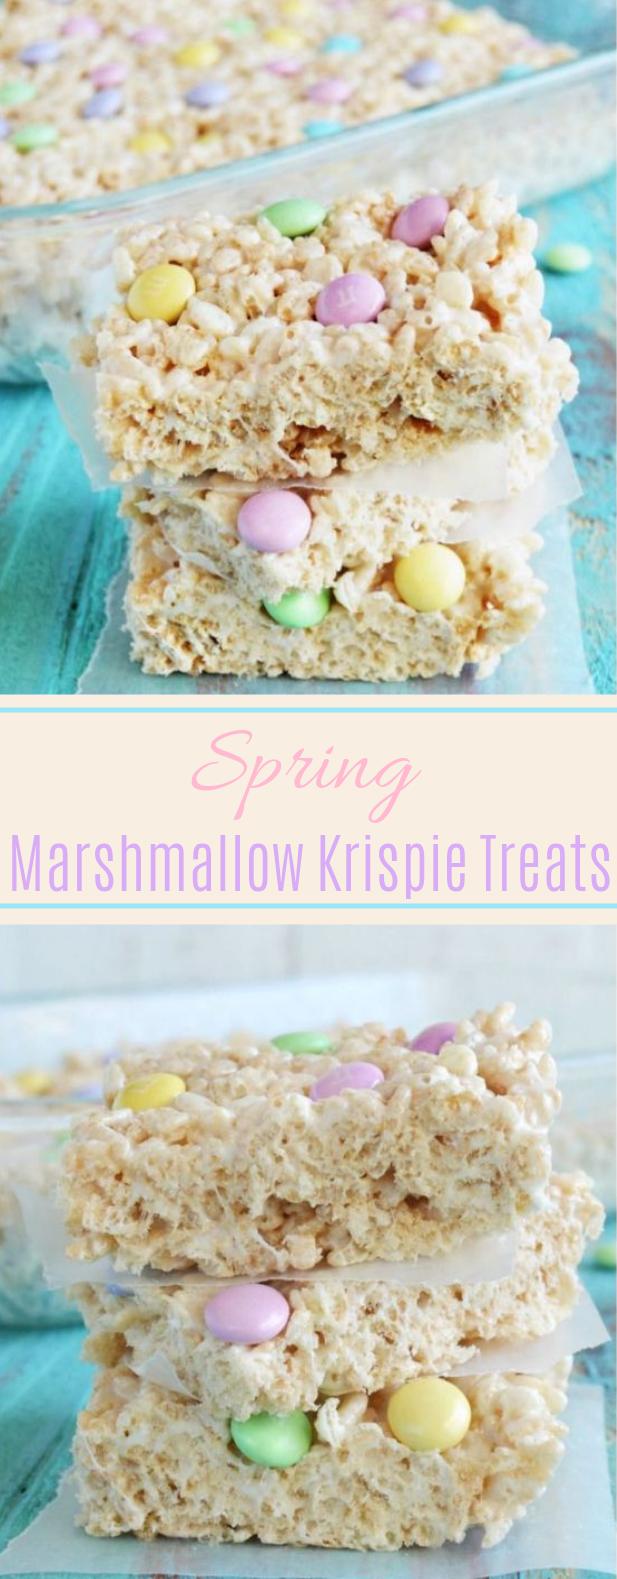 Spring Marshmallow Krispie Treats #snack #desserts